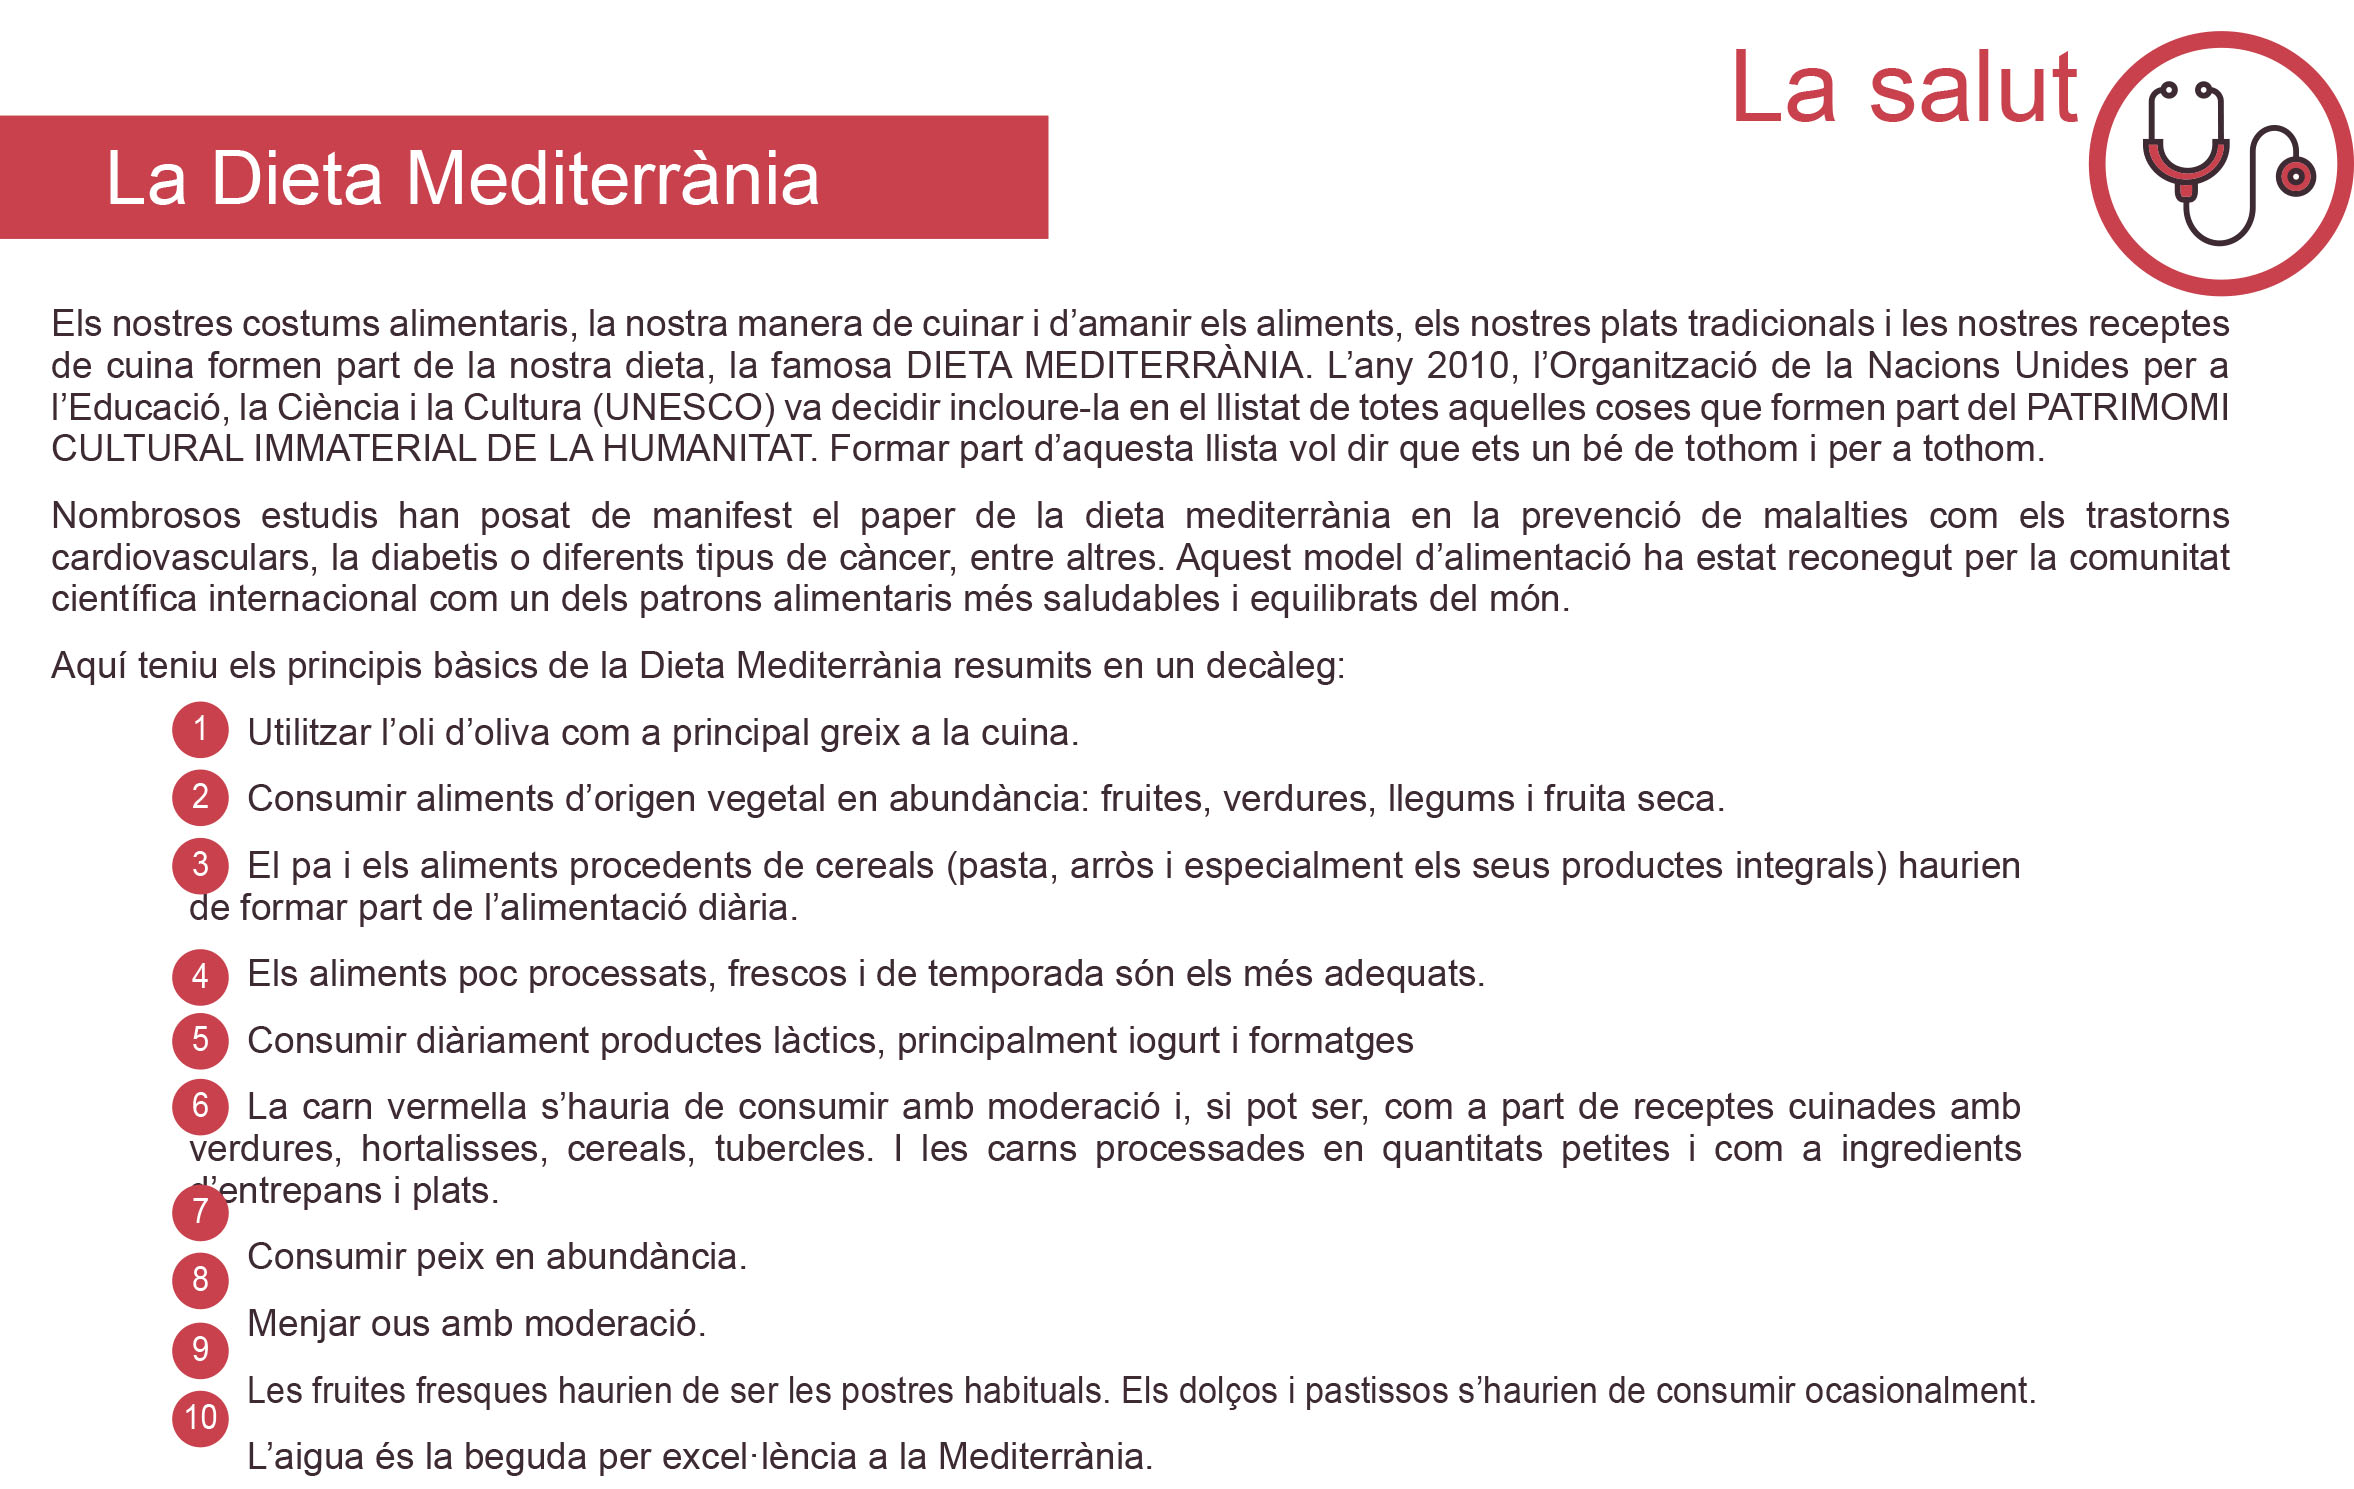 CS-3.1. La dieta mediterrània